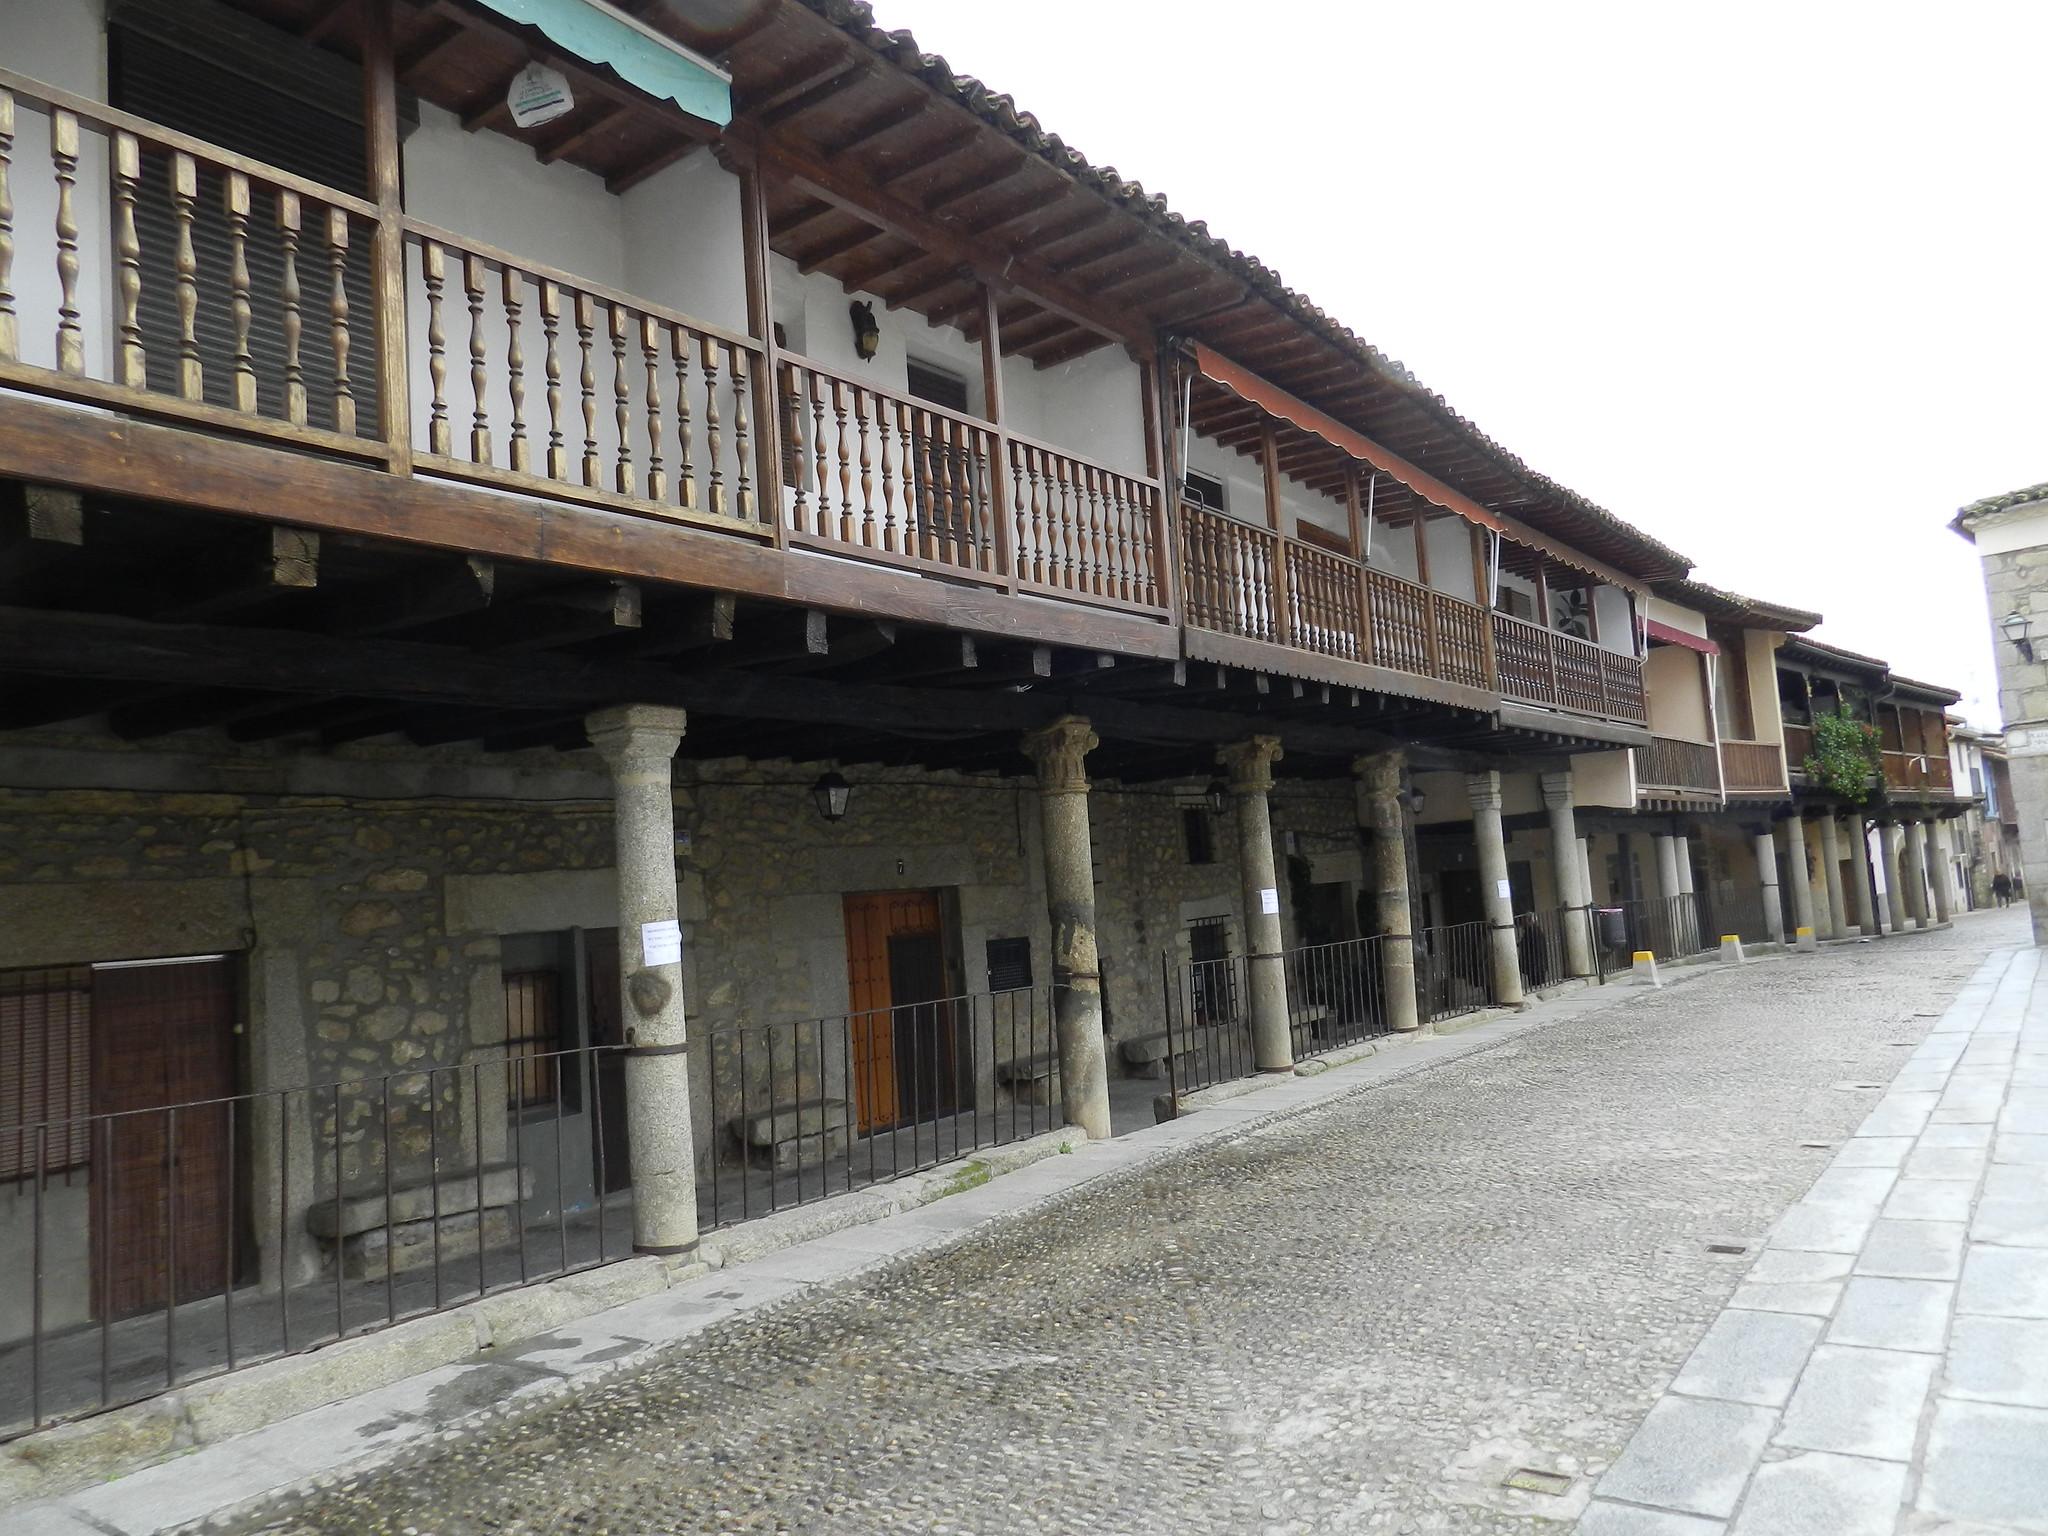 casas porticada Plaza de España Cuacos de Yuste Cáceres